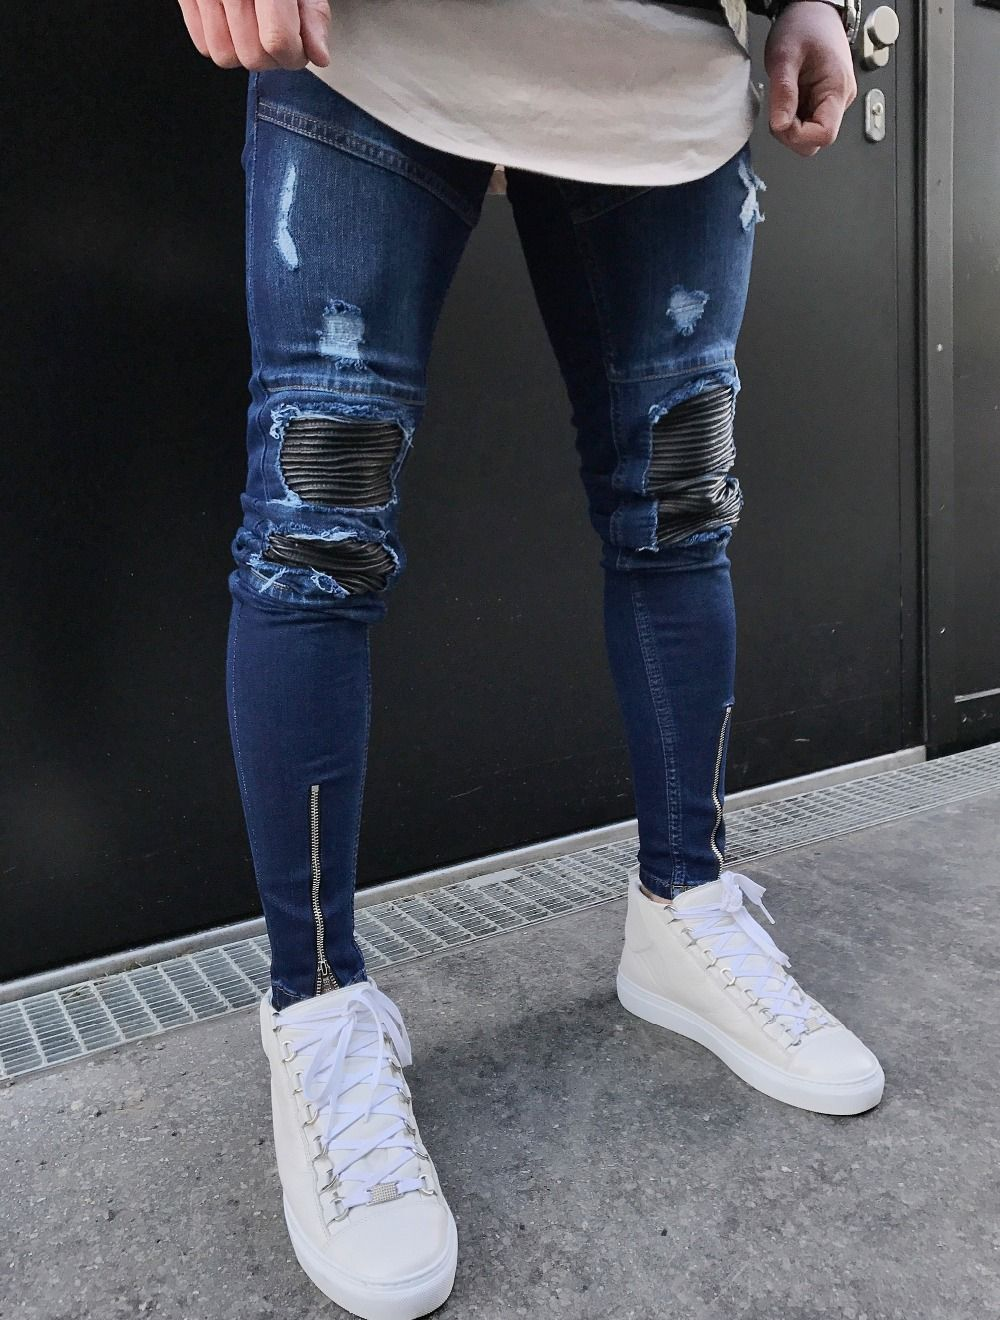 4ba8d2f89e Aliexpress.com  Comprar Azul Cremallera Dobladillo Stretch Rodilla biker  Jeans Rasgados Agujero Hombres de La Cadera hop marca de ropa pantalones  skinny ...